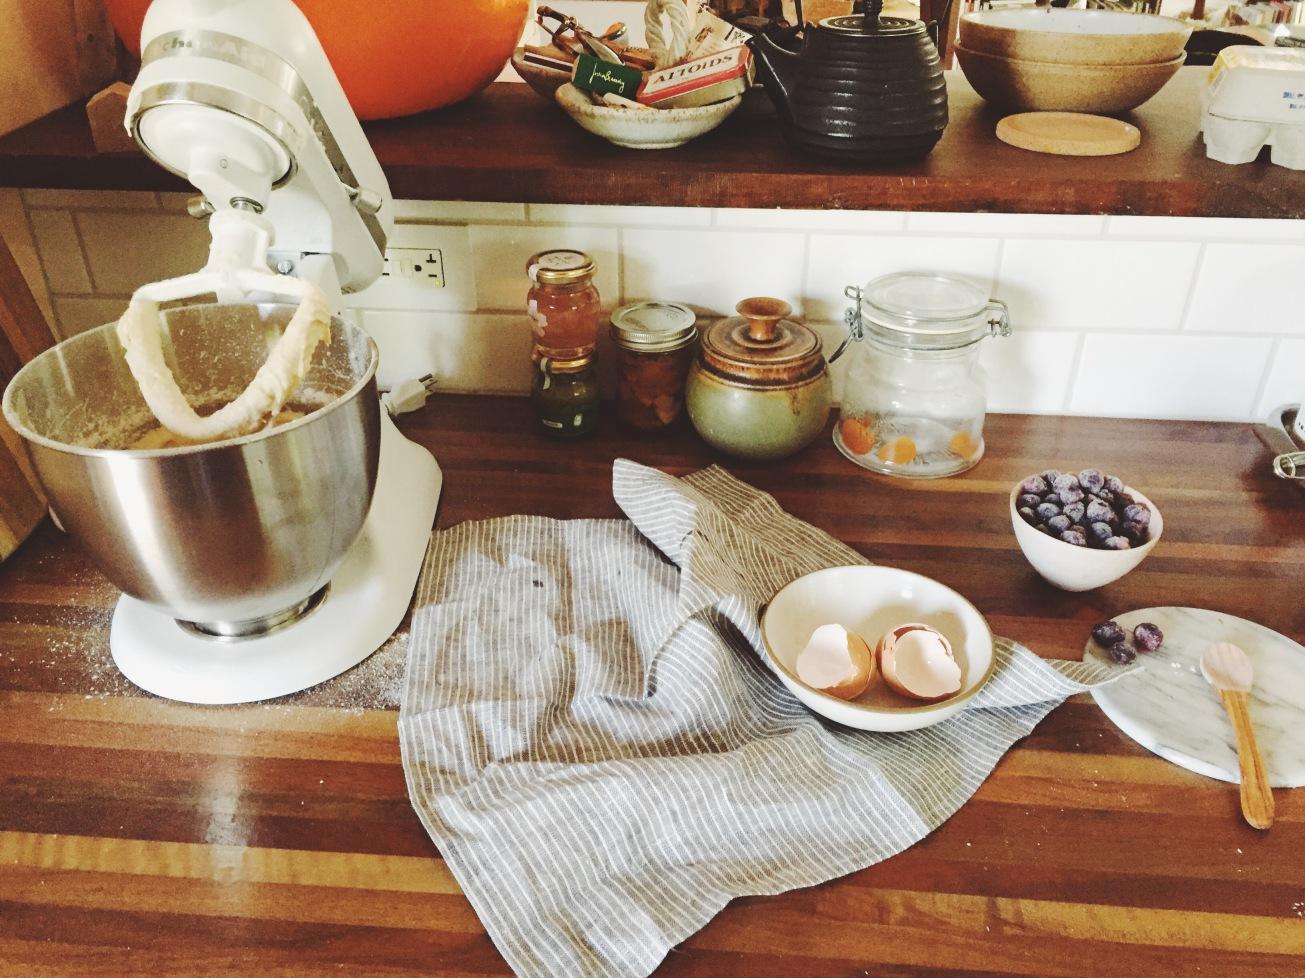 Blueberry muffin recipe _Magic Dream LIfe